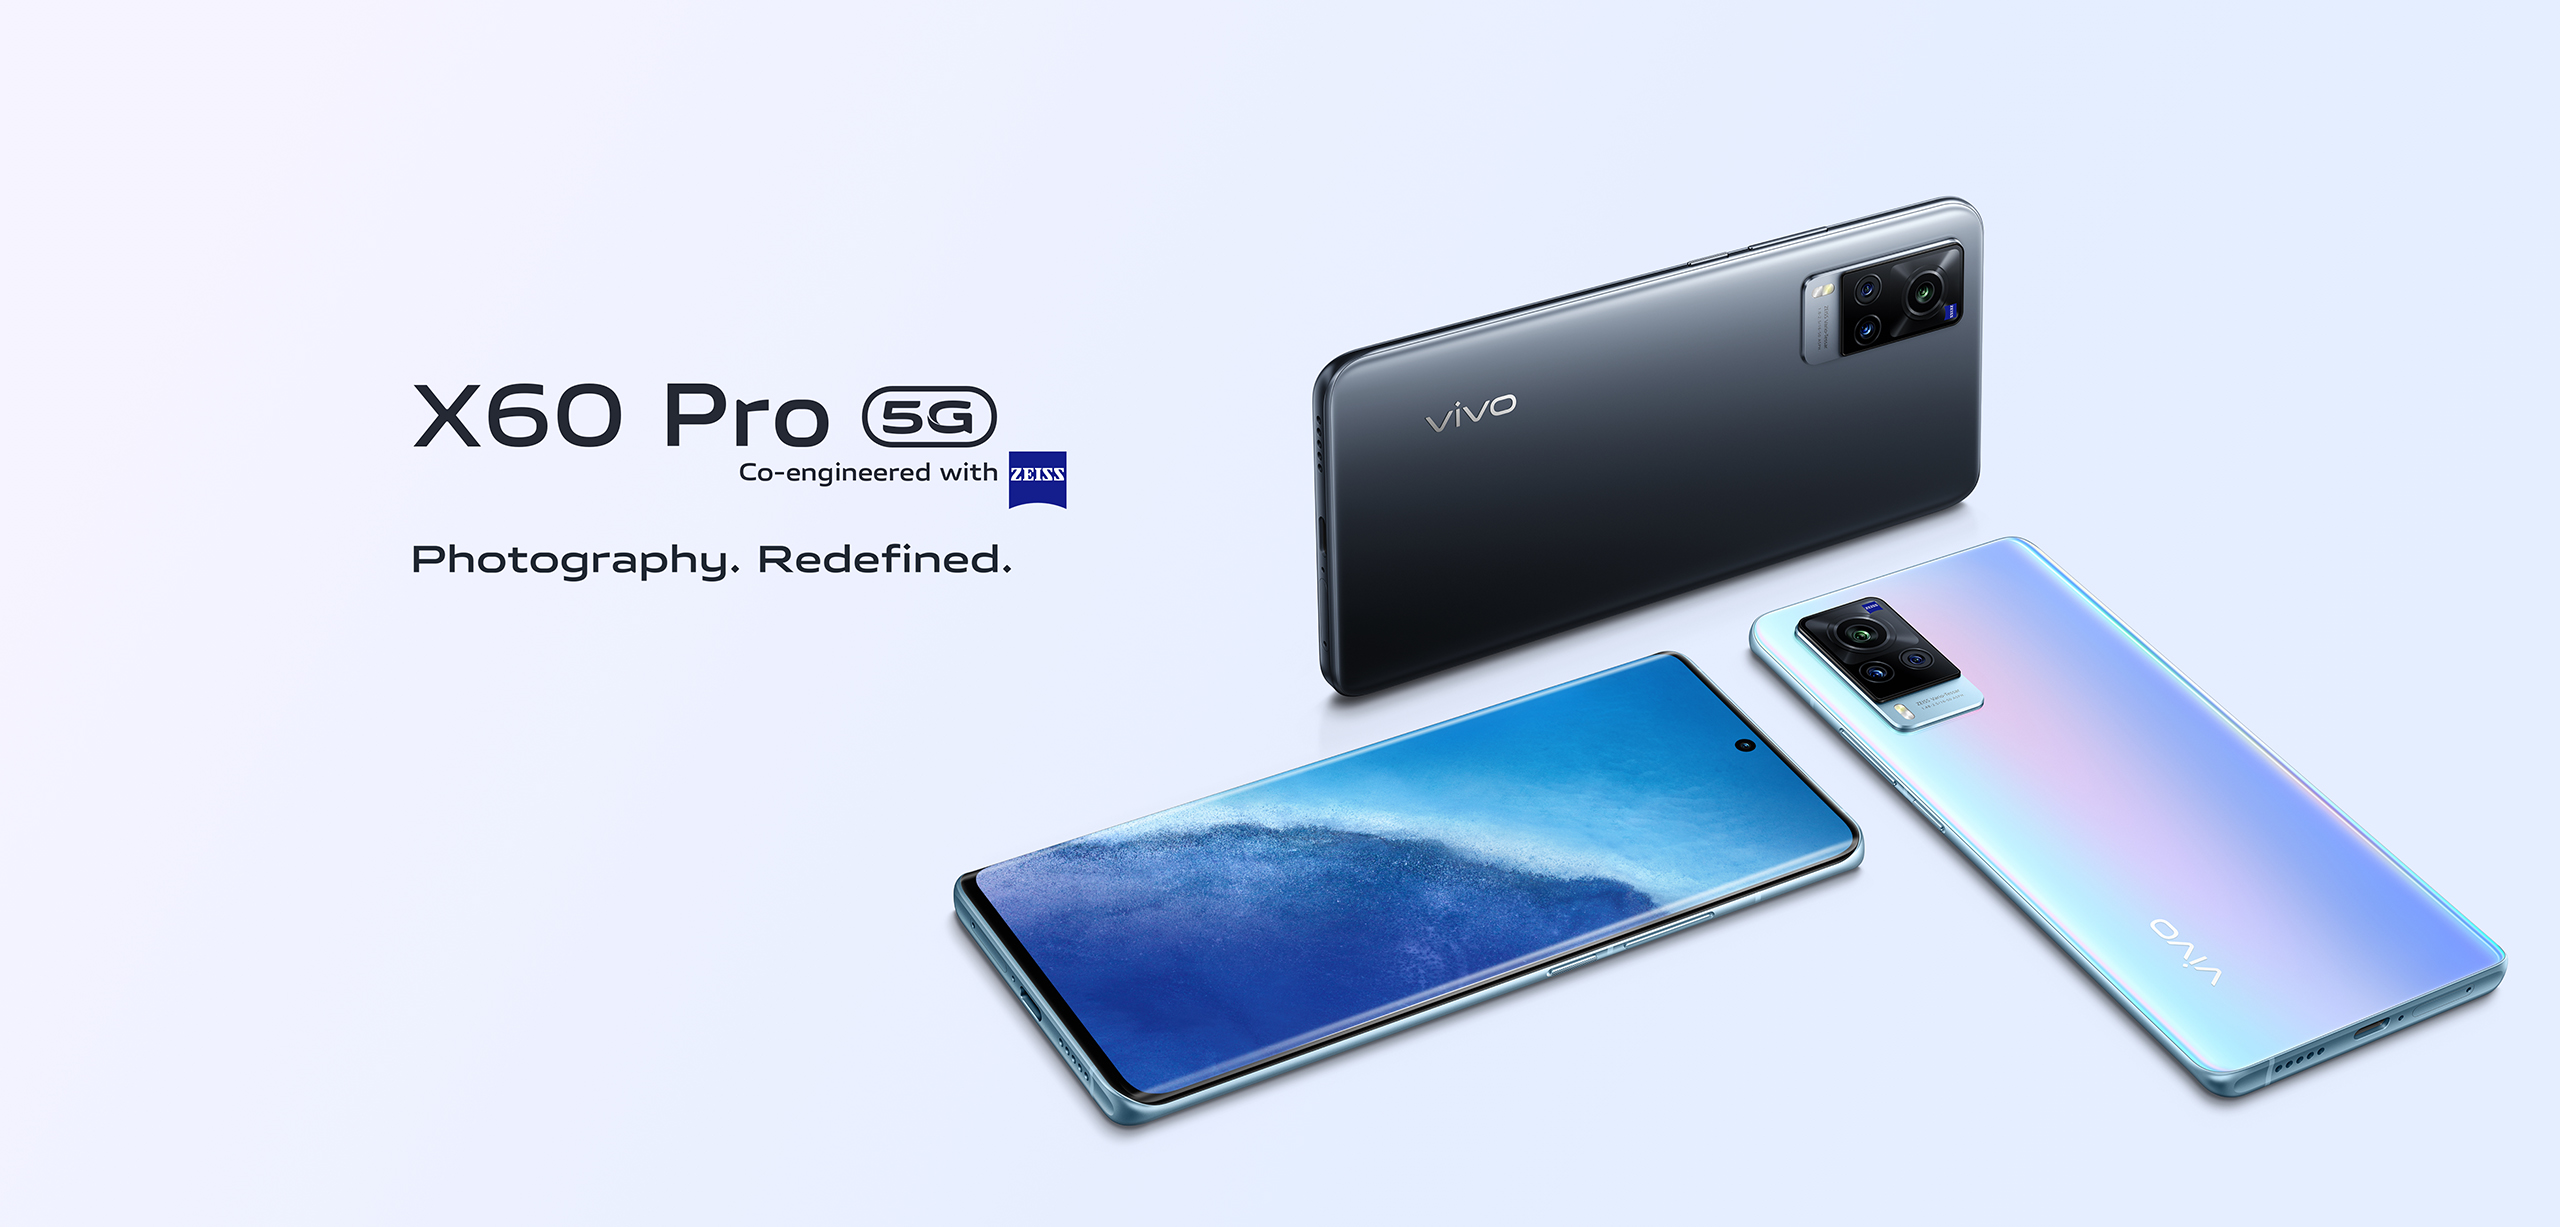 فيفو تعلن رسمياً عن هاتفي Vivo X60 و Vivo X60 Pro في الخارج